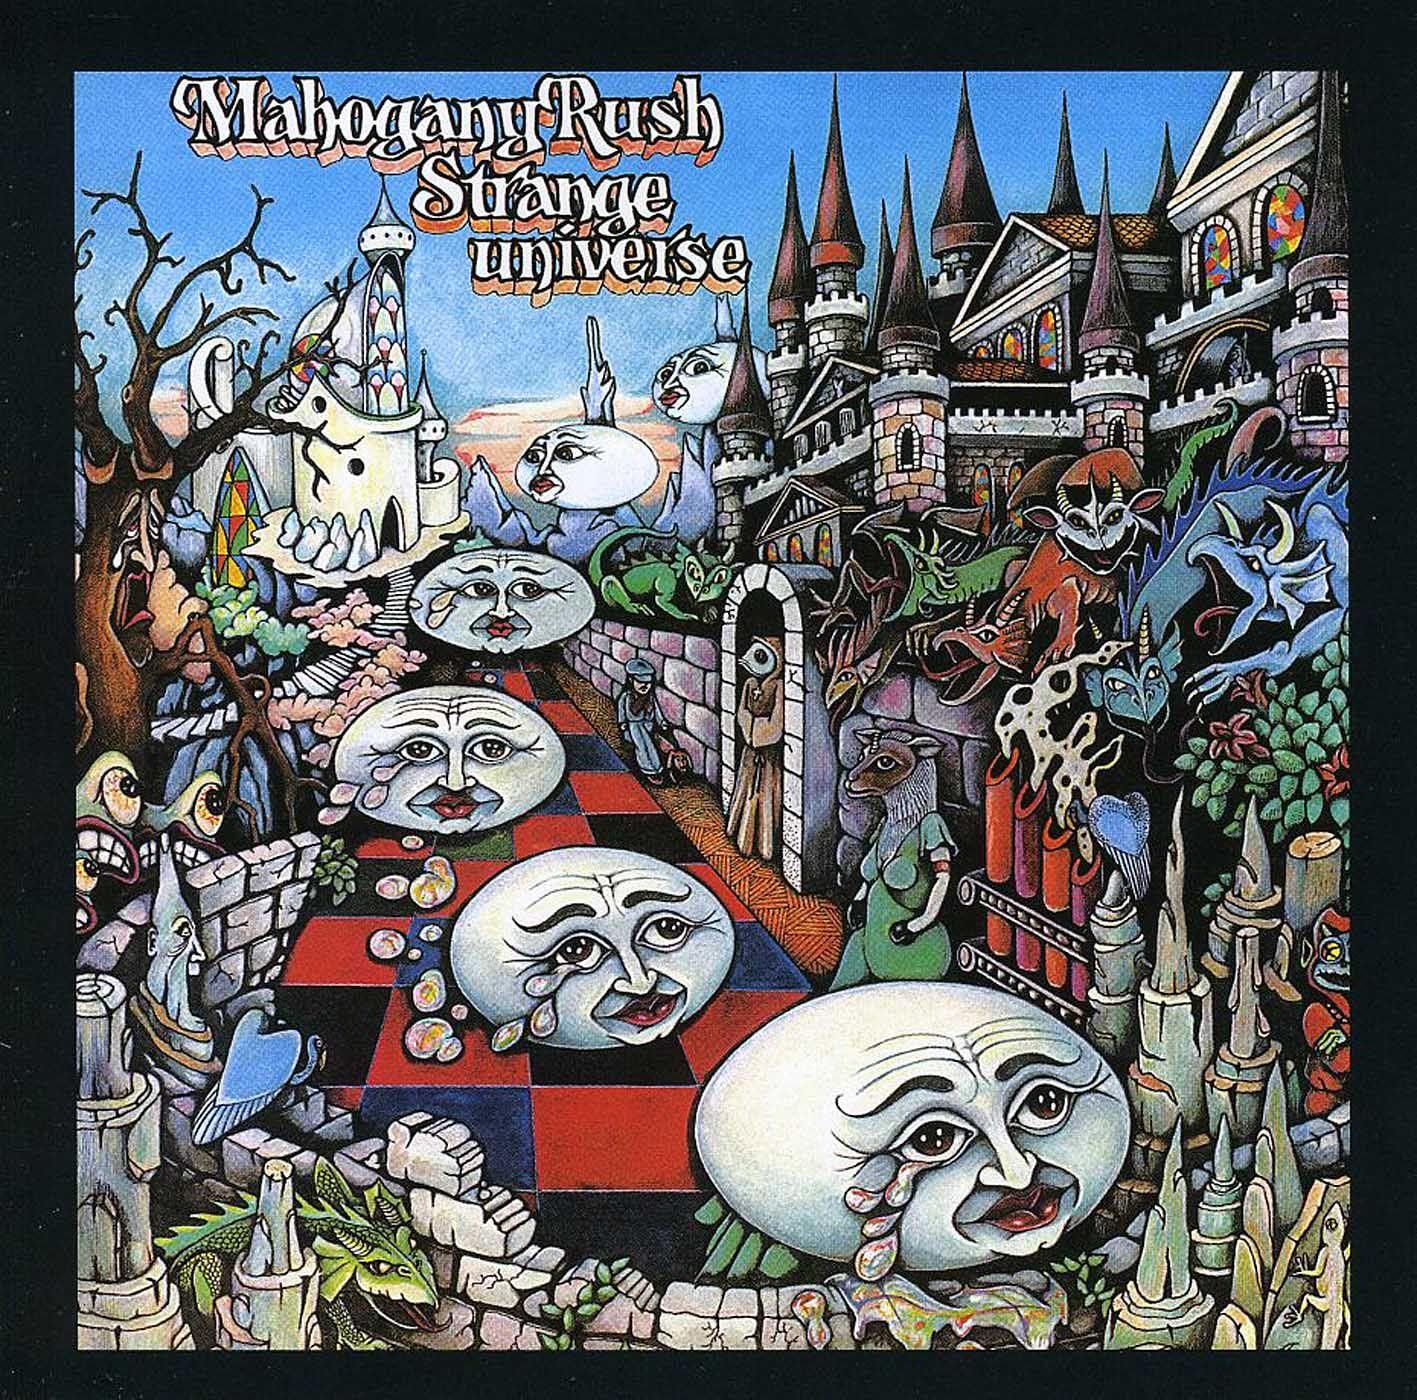 Mahogany Rush - Strange Universe